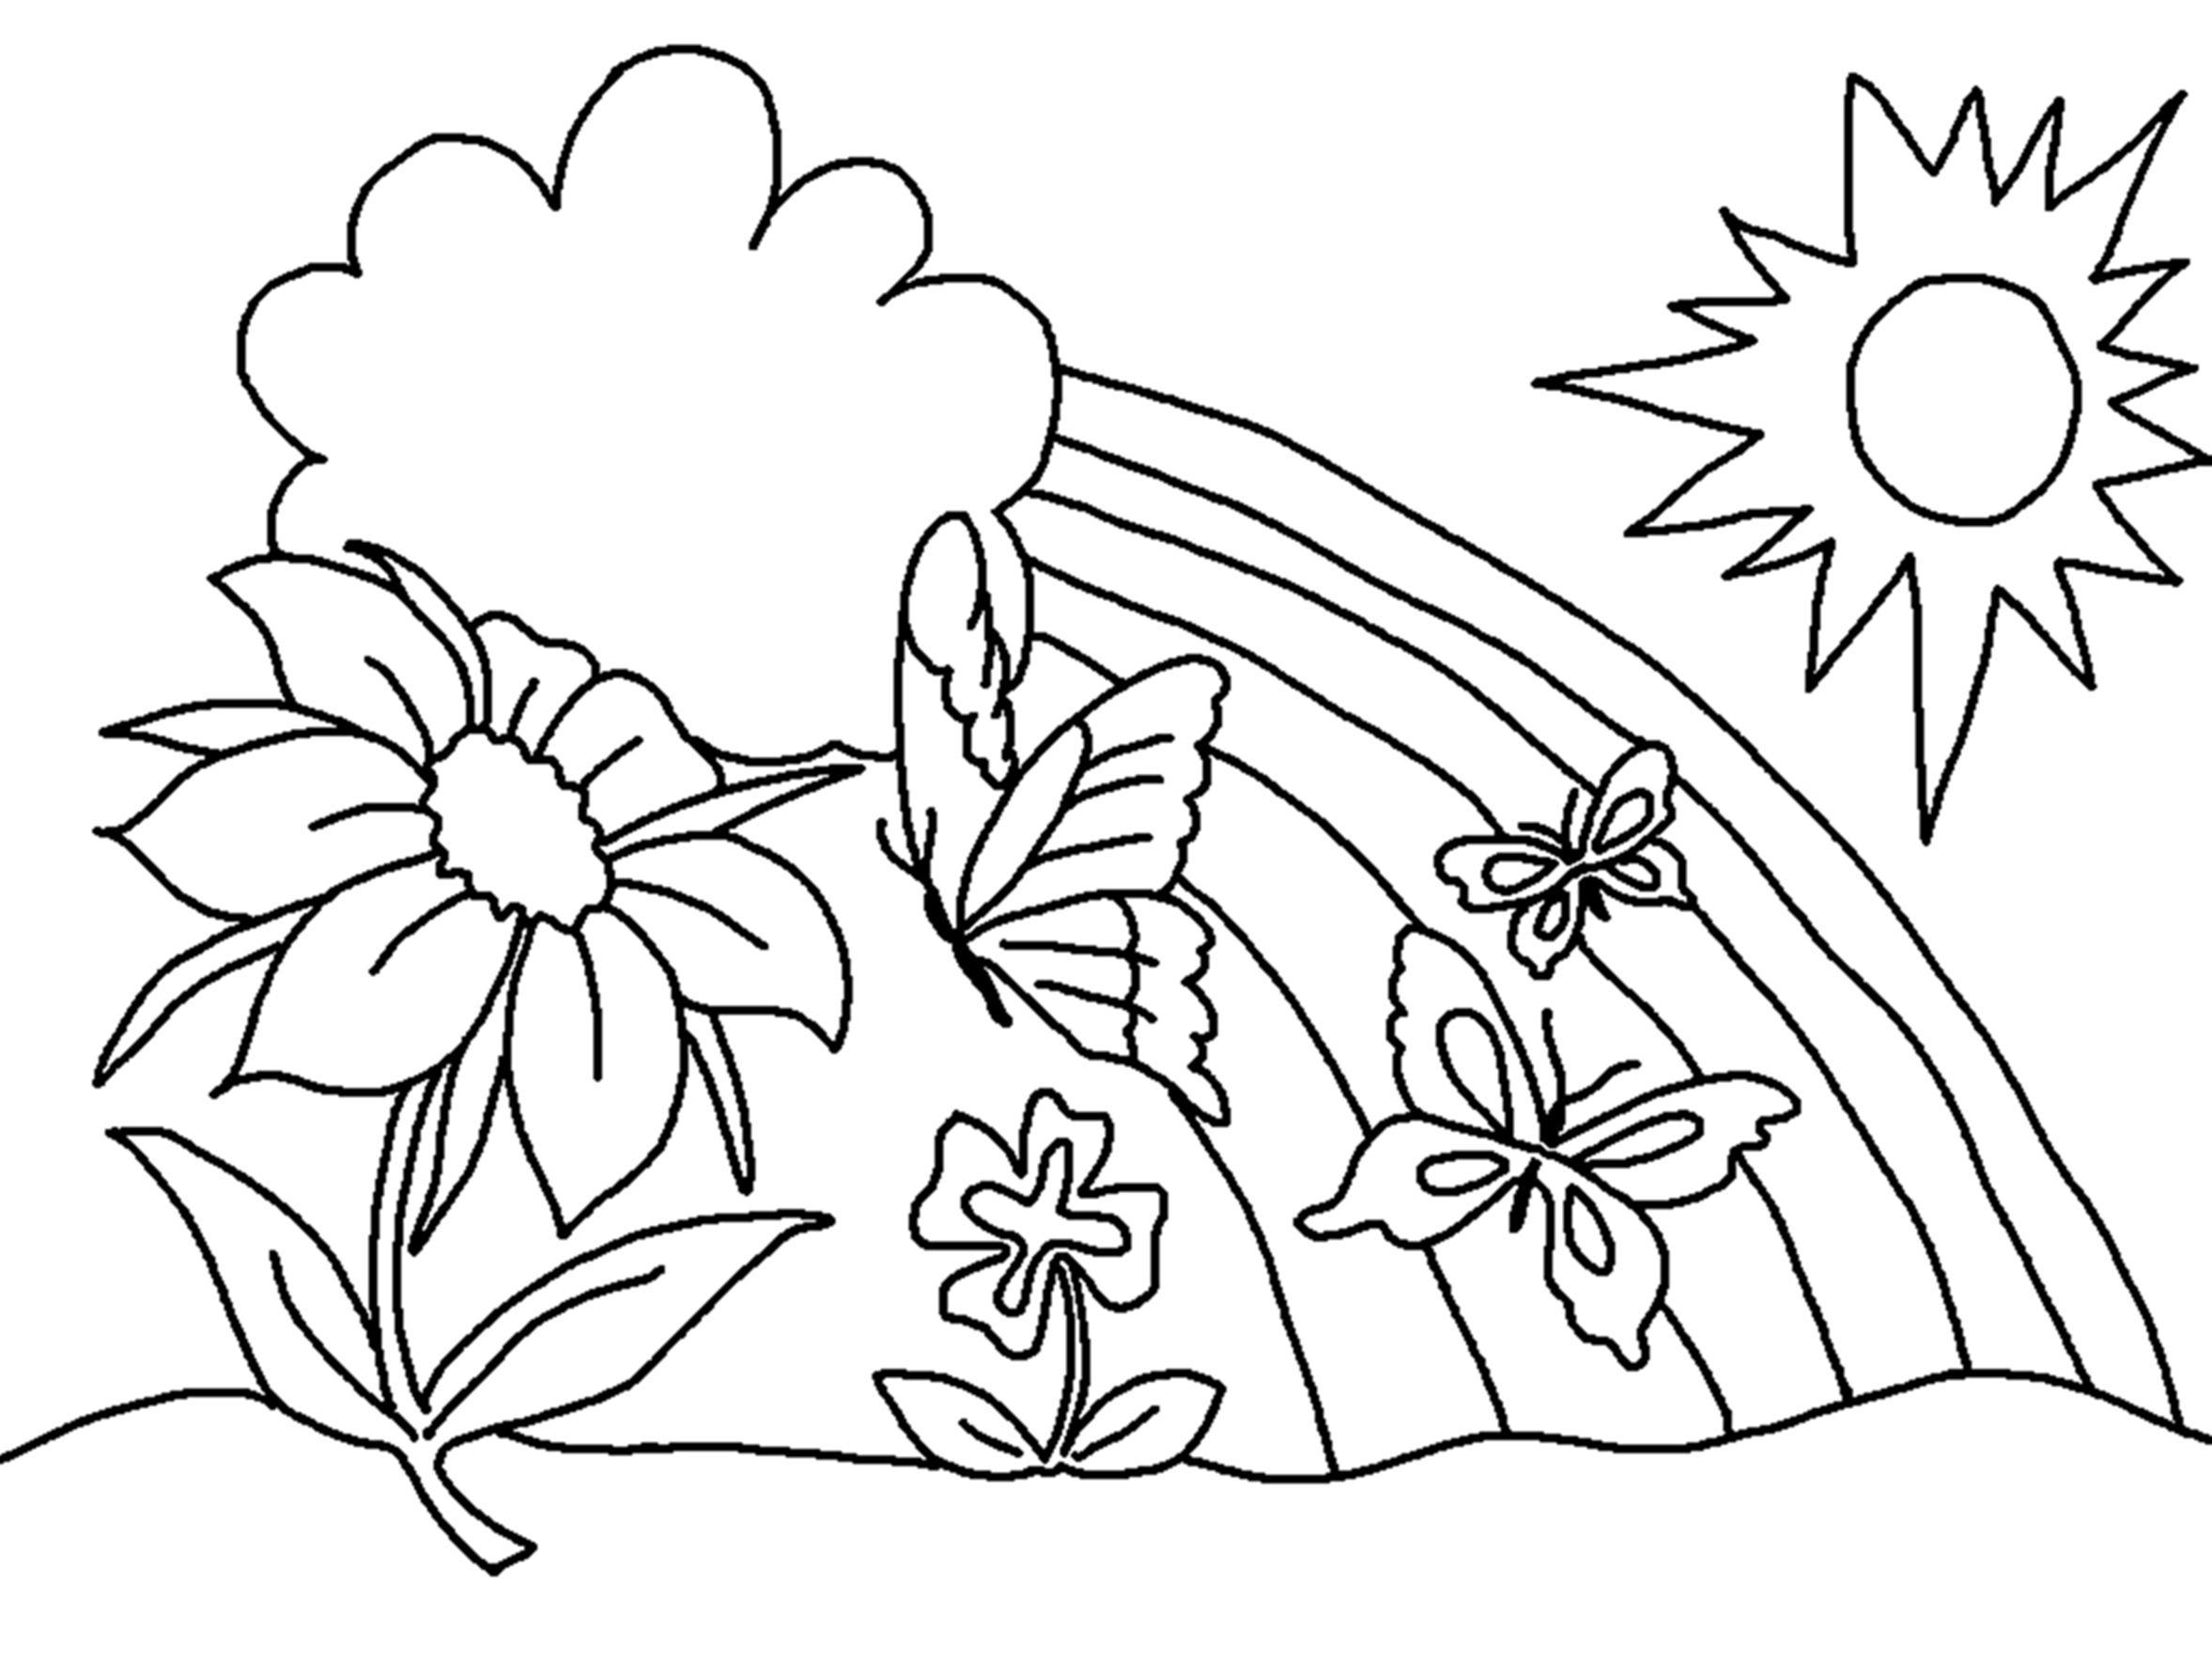 Free Printable Coloring Pages For Preschoolers – With Girls Also - Free Printable Coloring Pages For Preschoolers